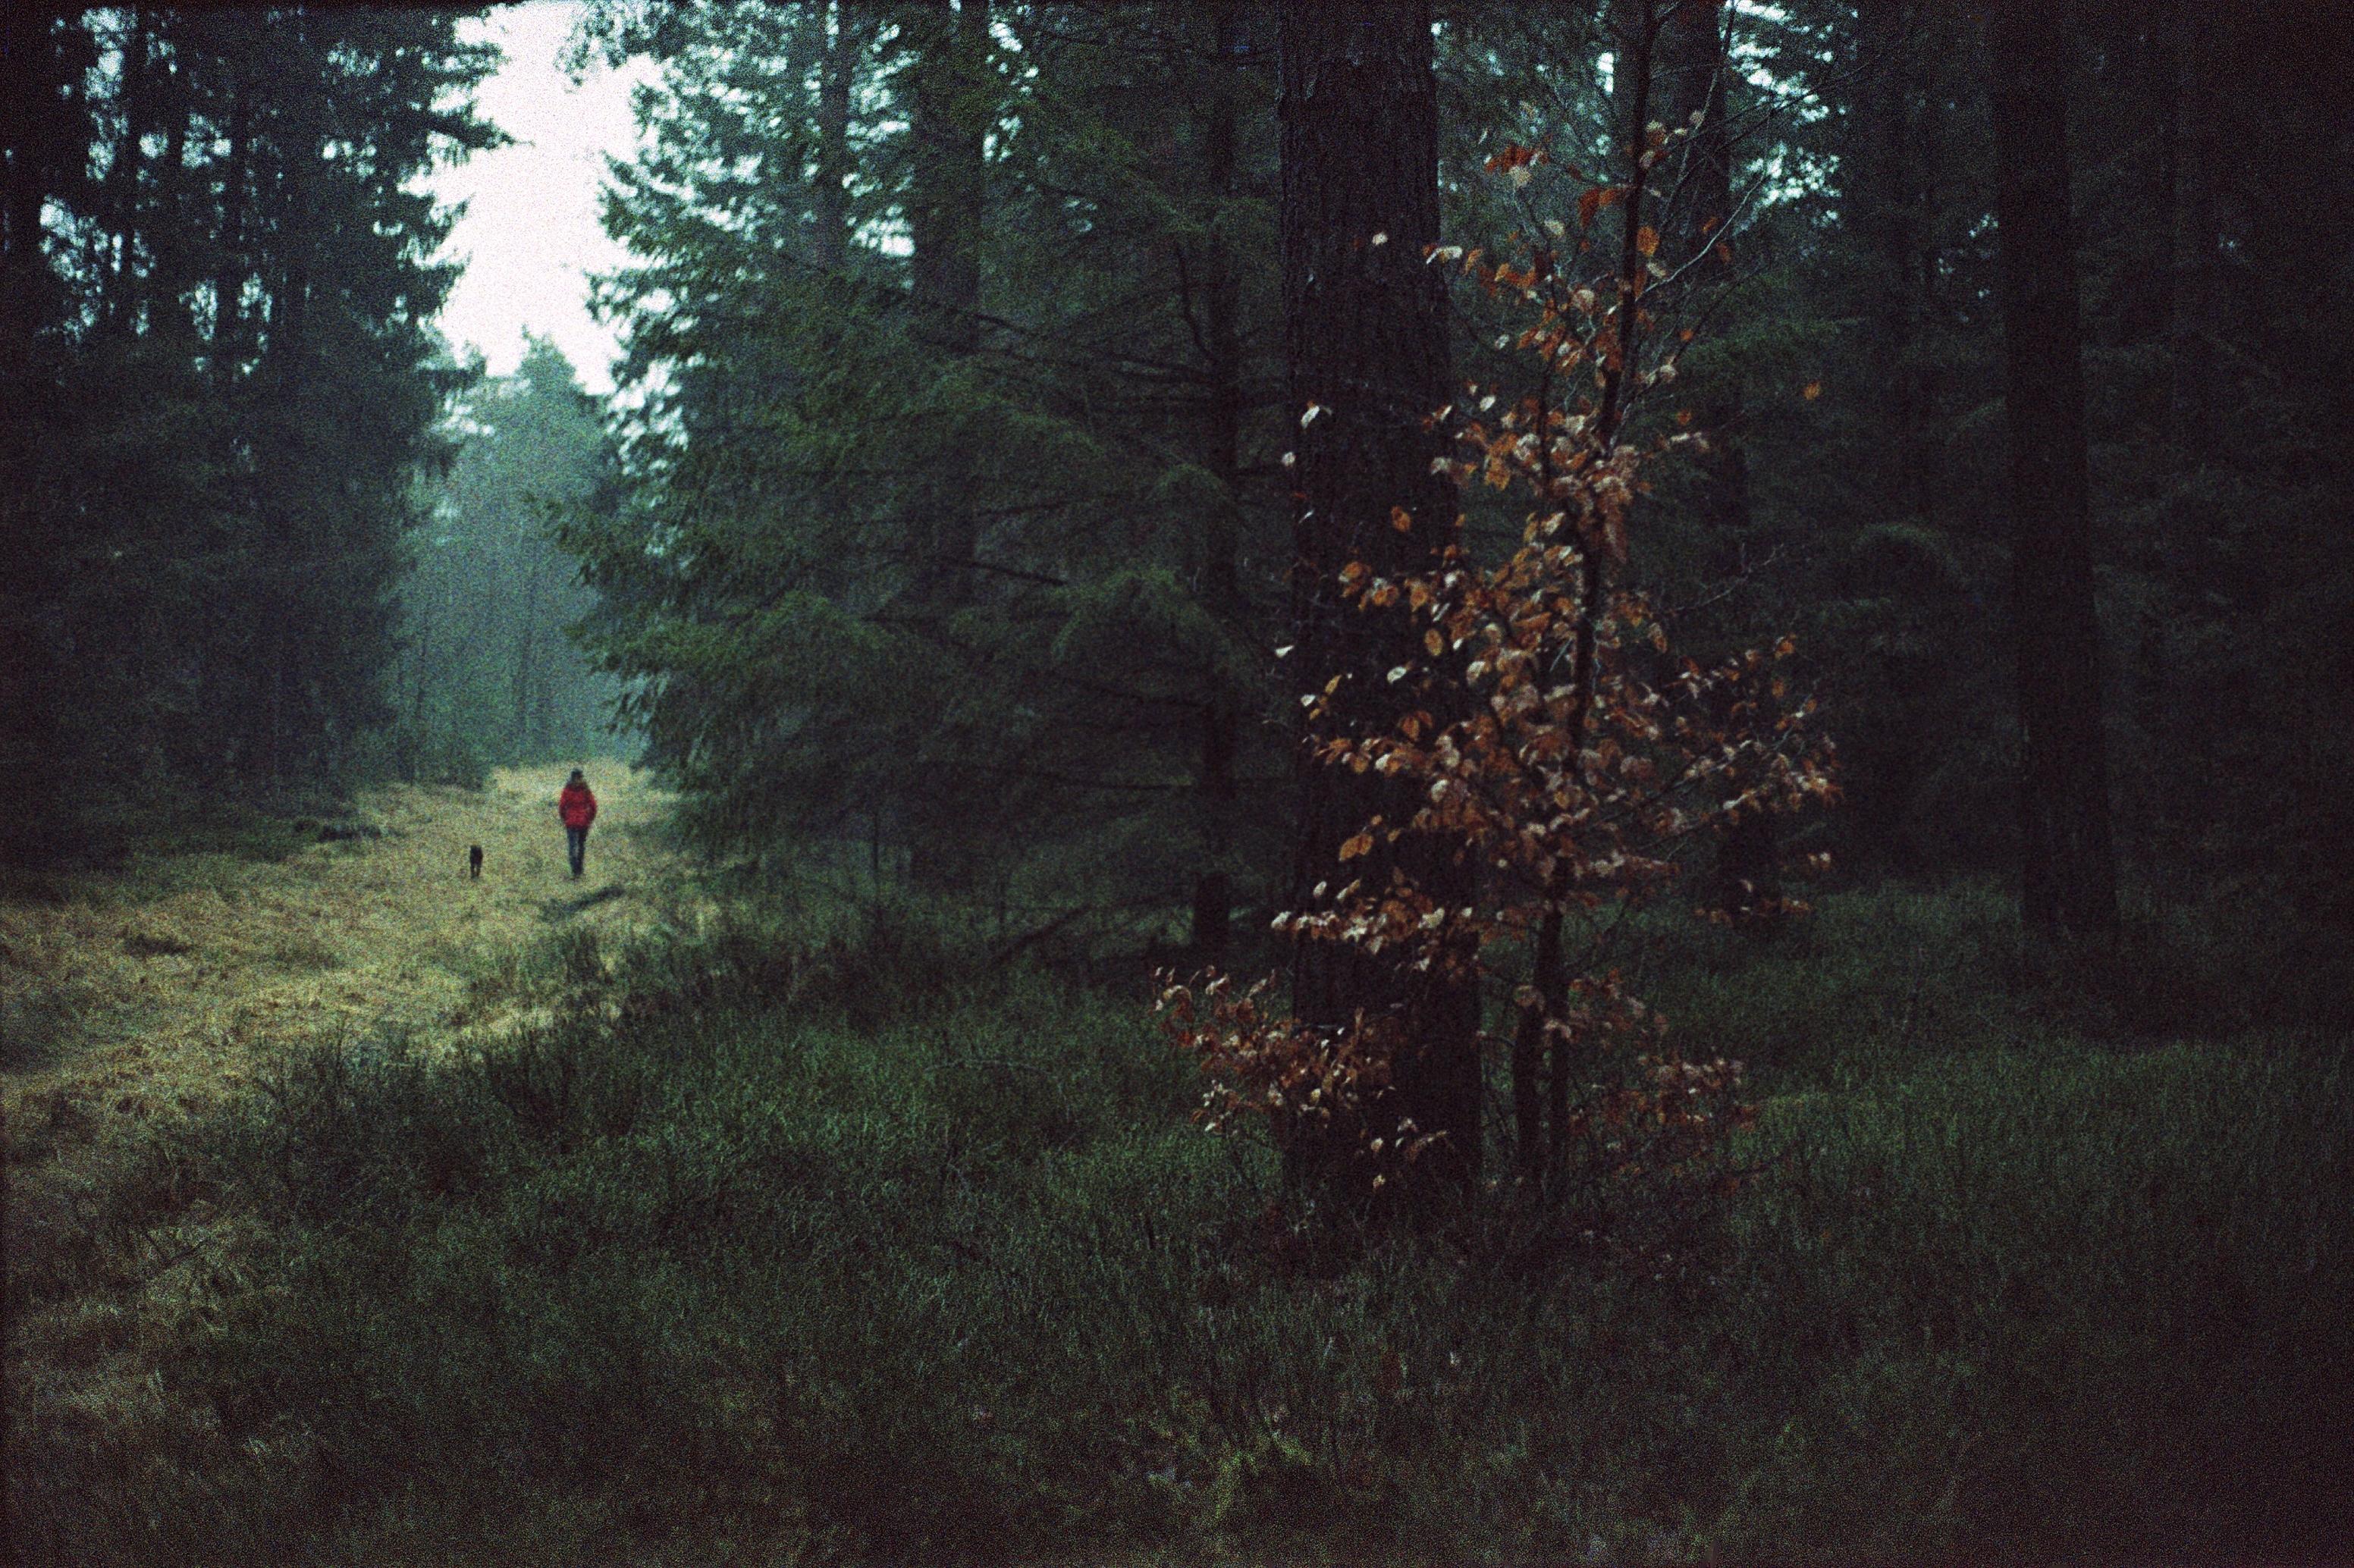 Hintergrundbilder : 35mm farbe film analoge analog